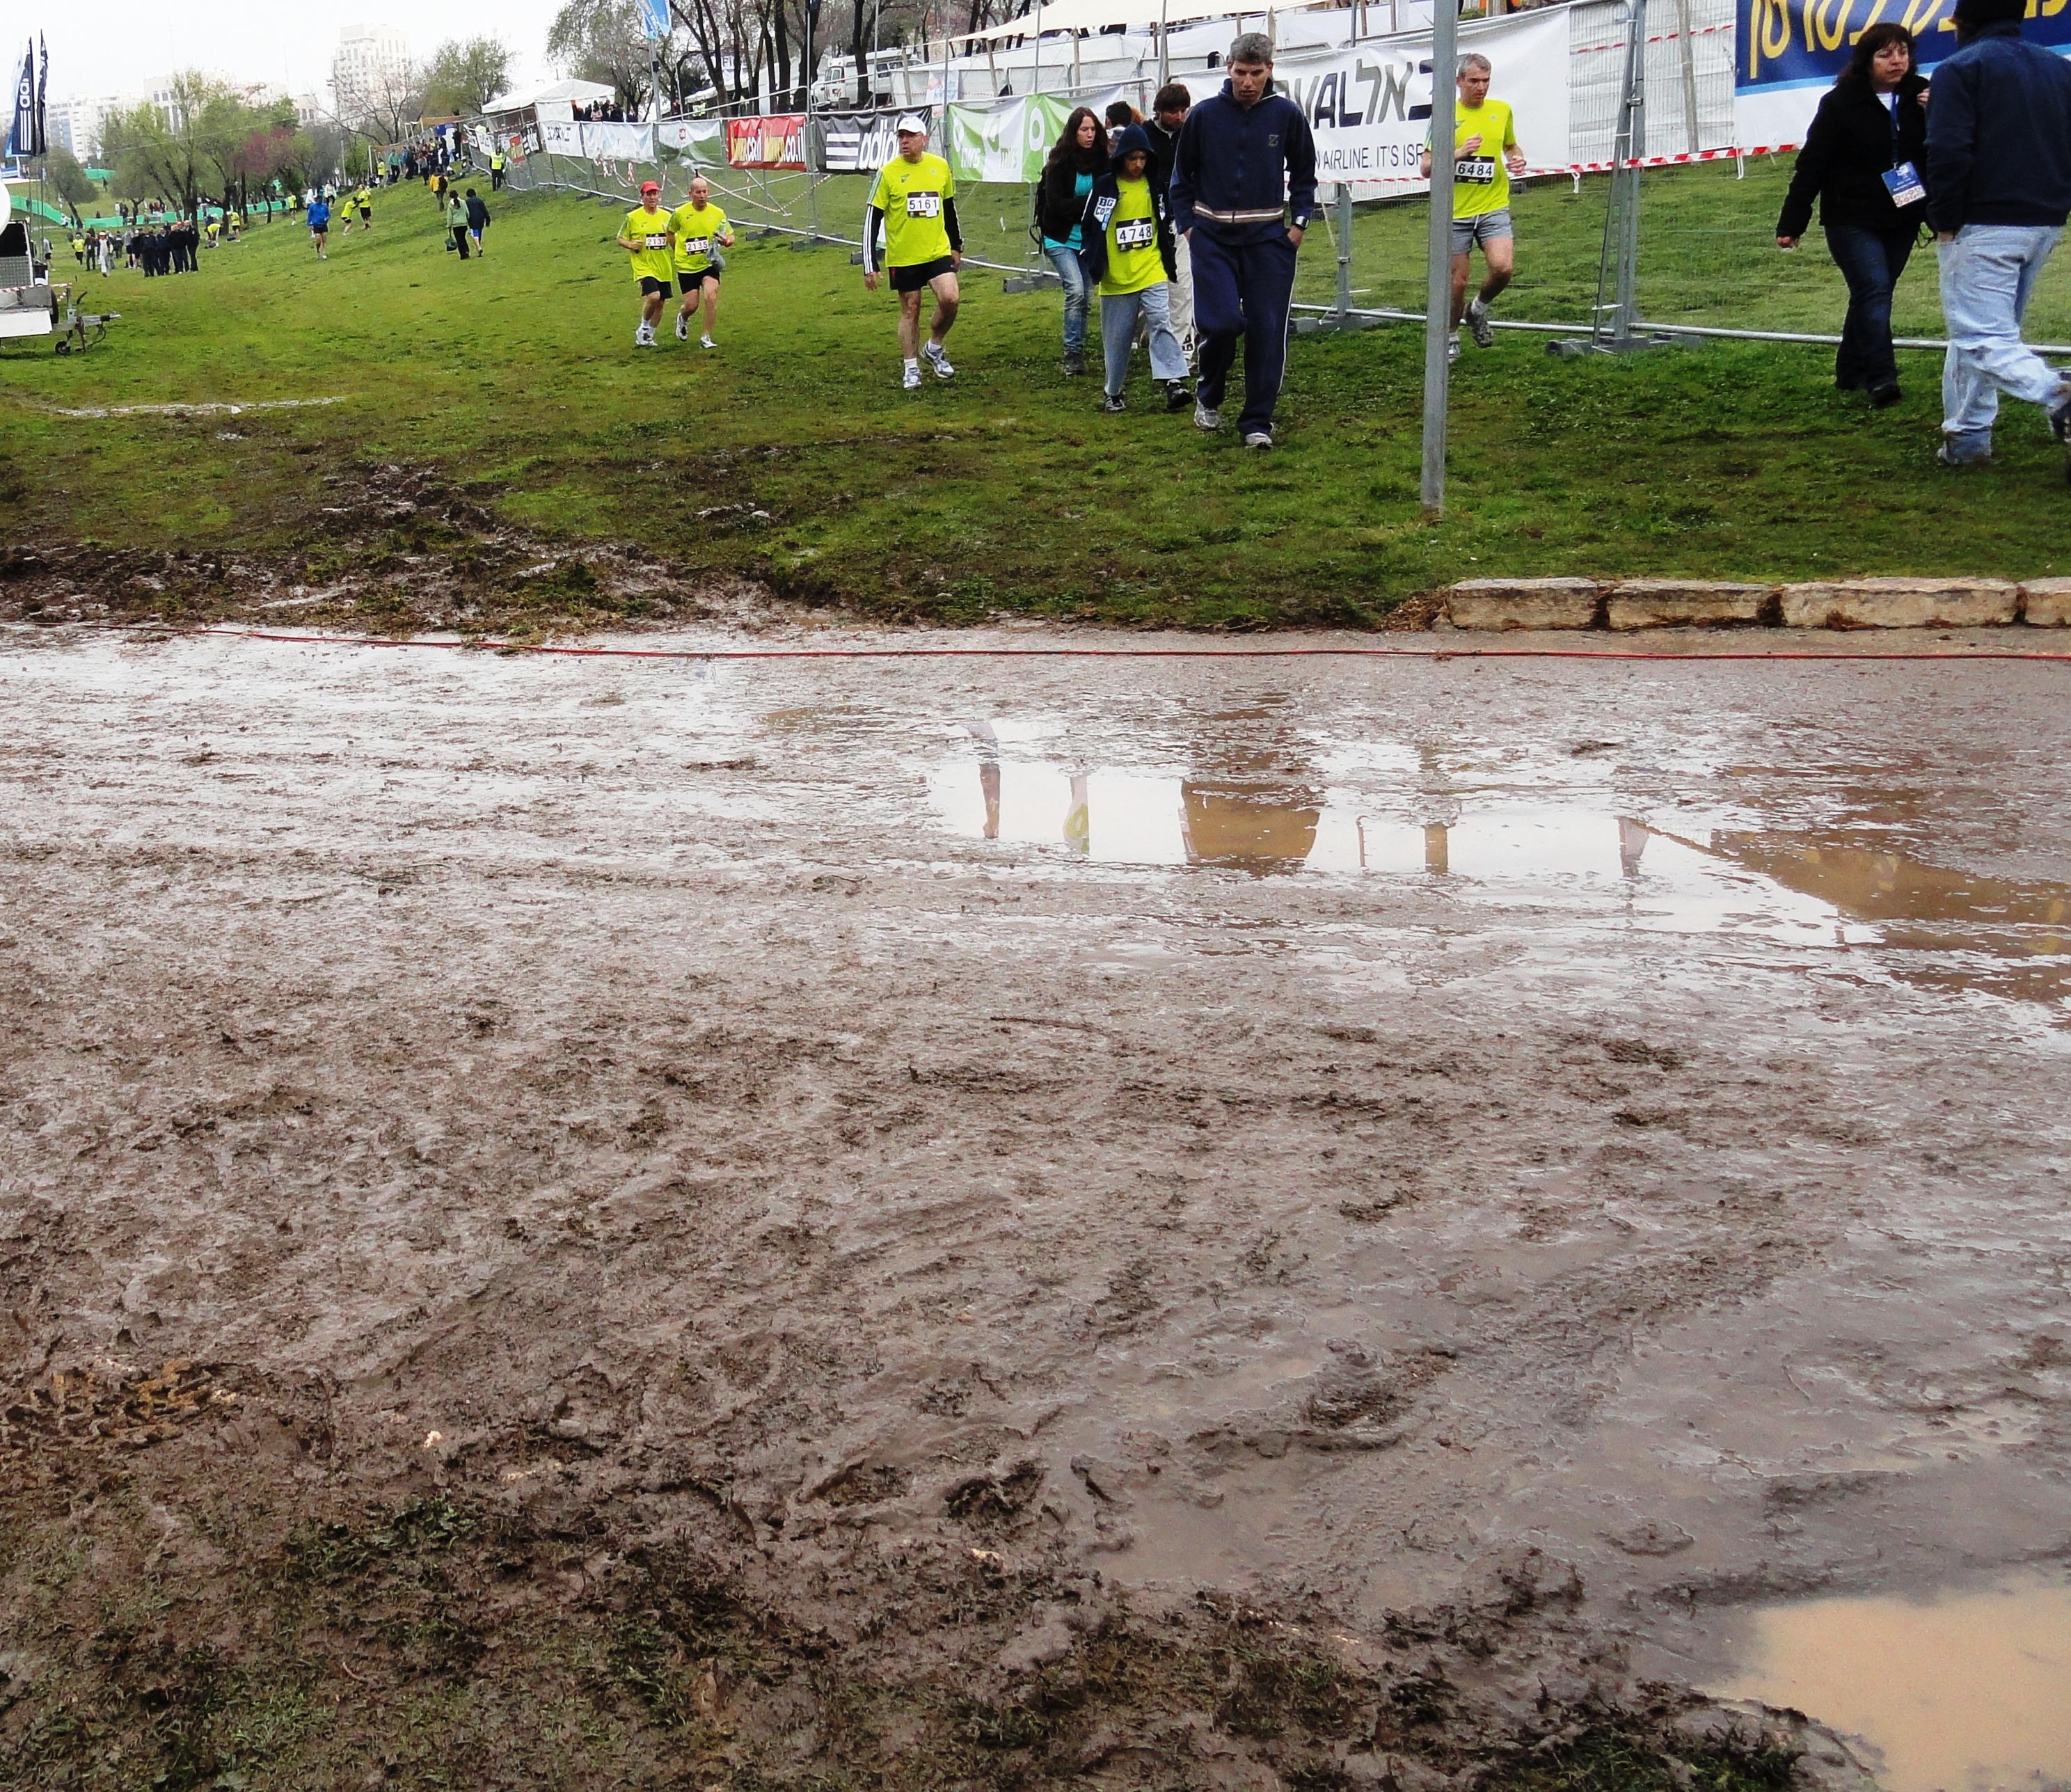 mud image, Jerusalem marathon image